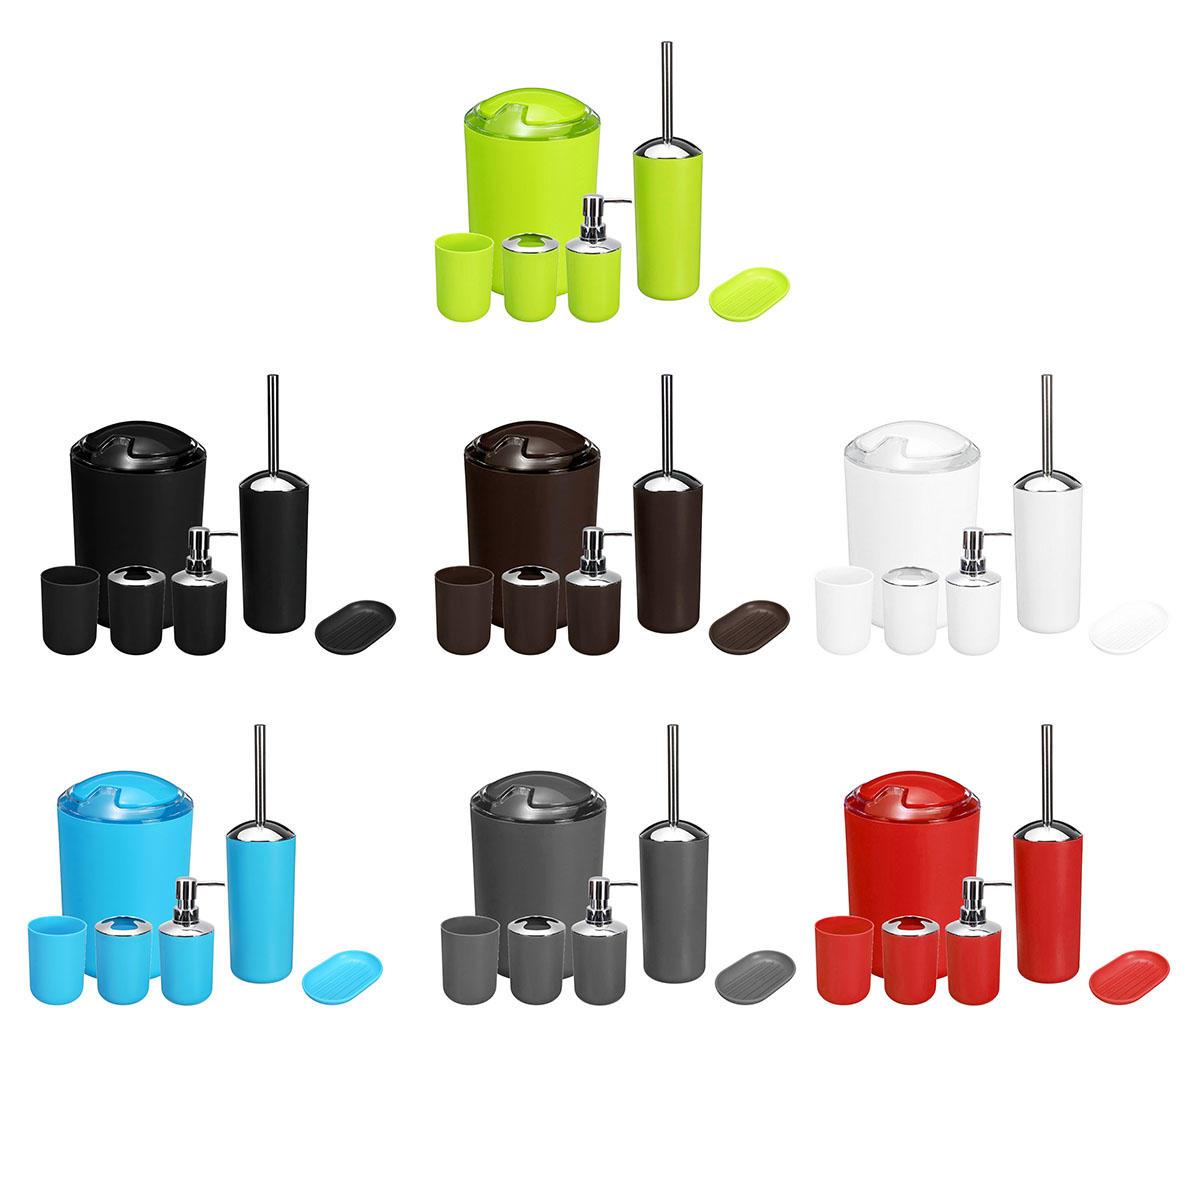 6pcs Bathroom Accessories Set Storage Black Soap Dispenser Toothbrush Holder Home Decor Accessories